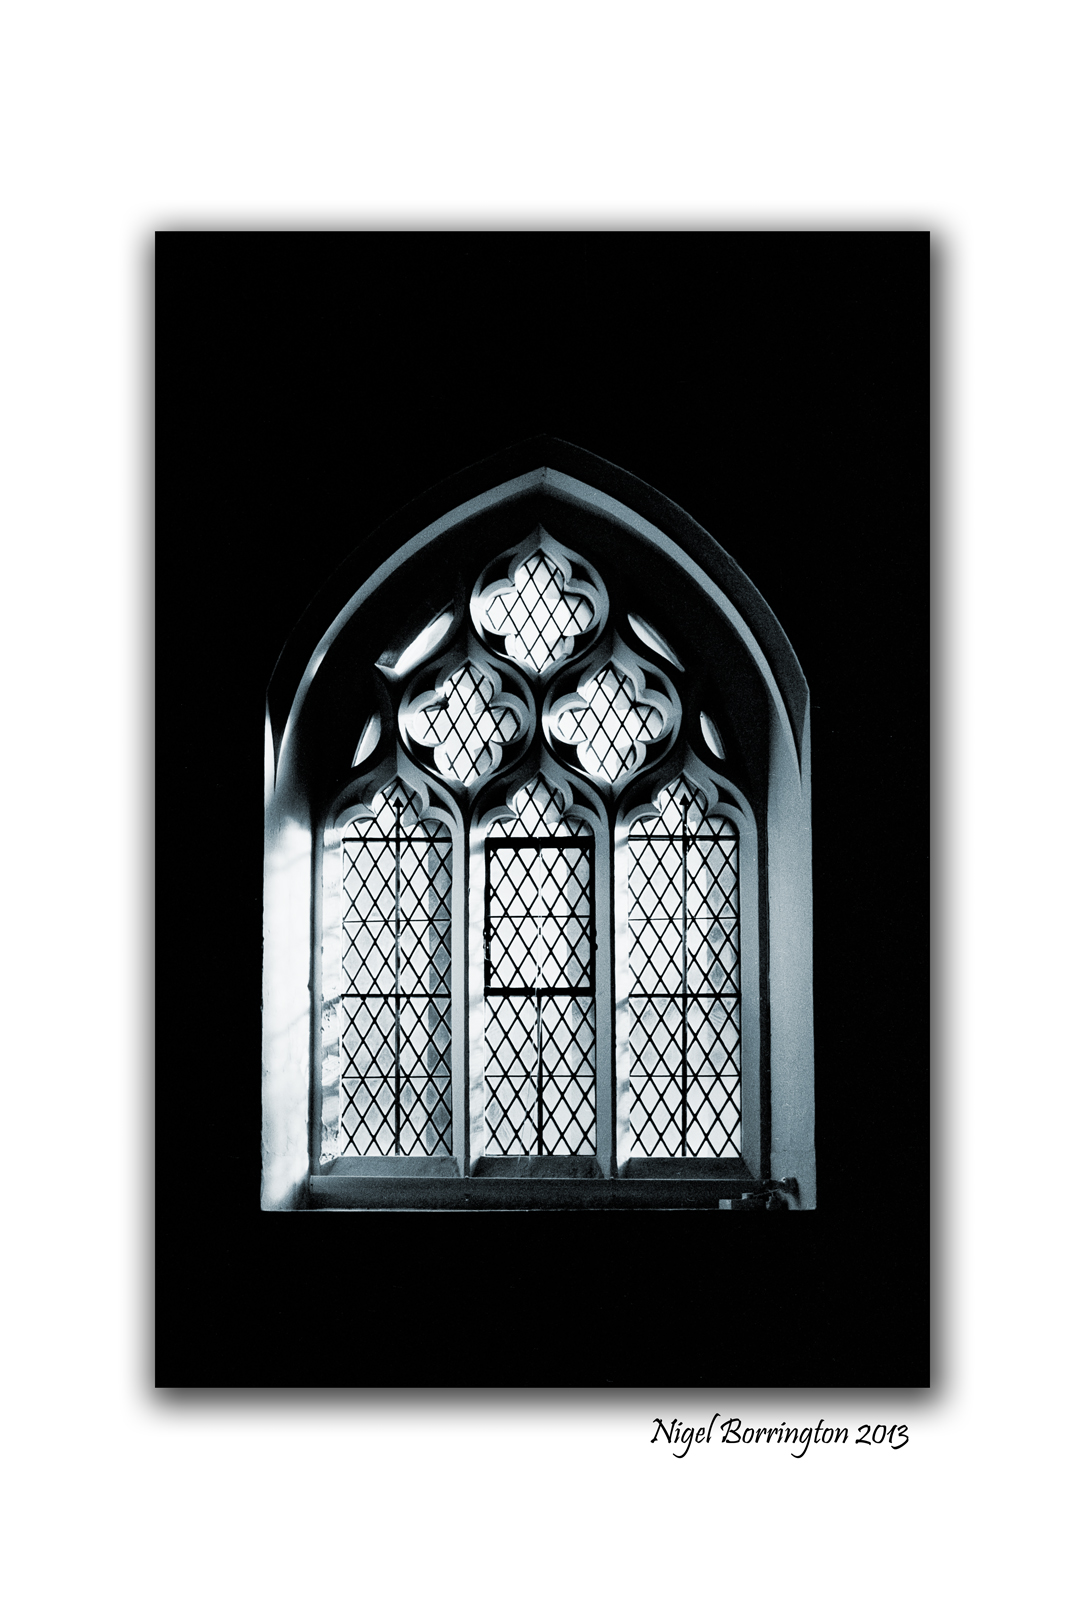 North mimms church window